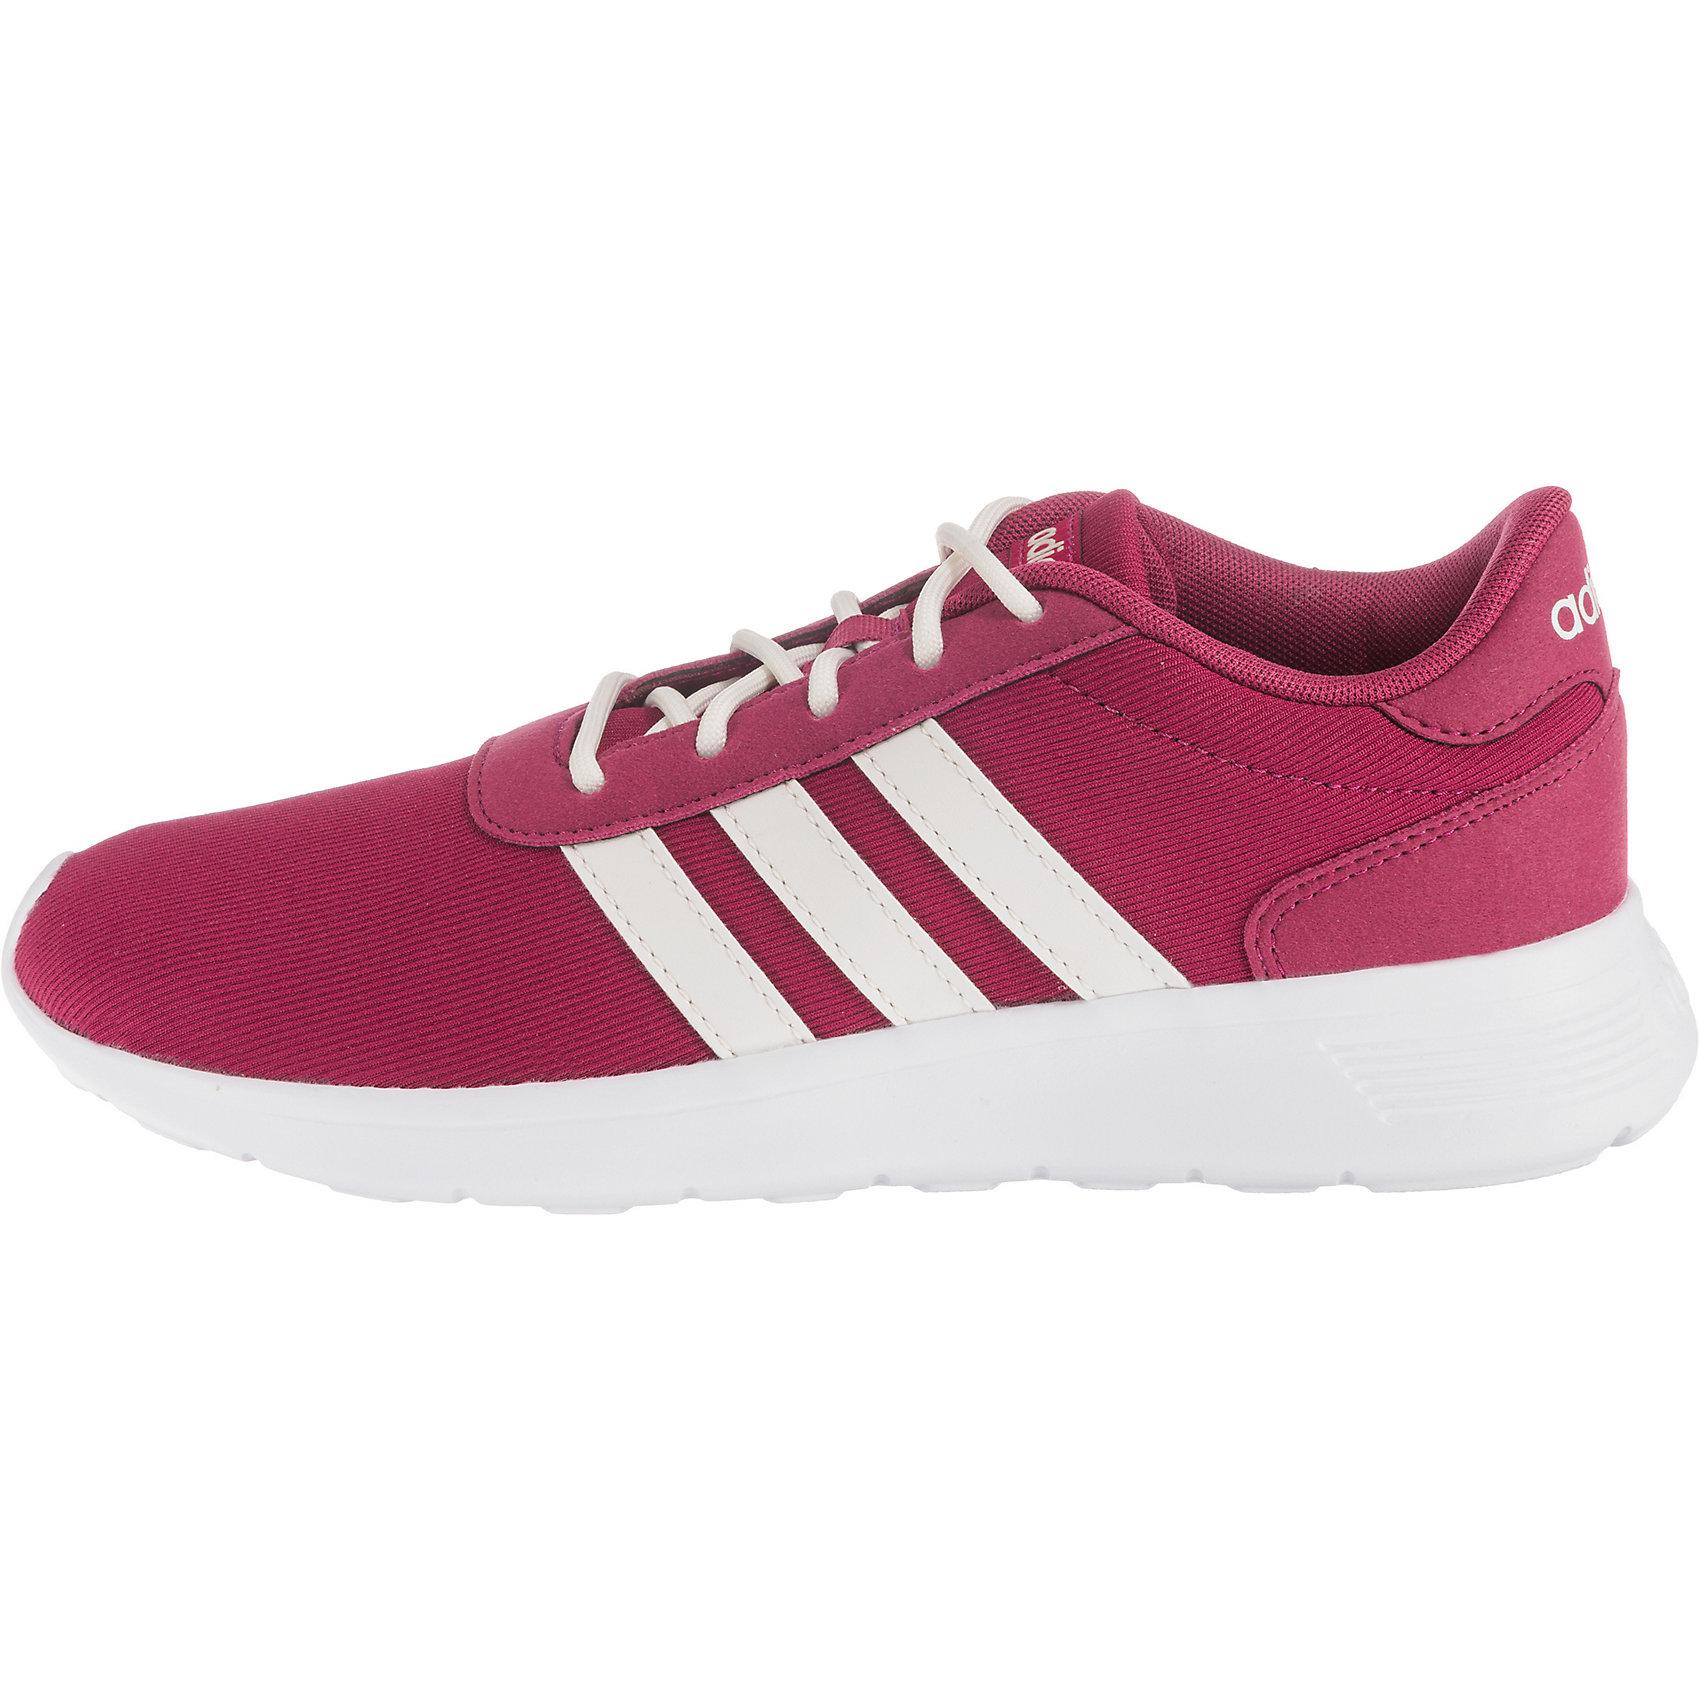 Neu adidas Sport InspiROT Lite Racer Sneakers Niedrig 8340360 8340360 Niedrig für Damen a3ebd5